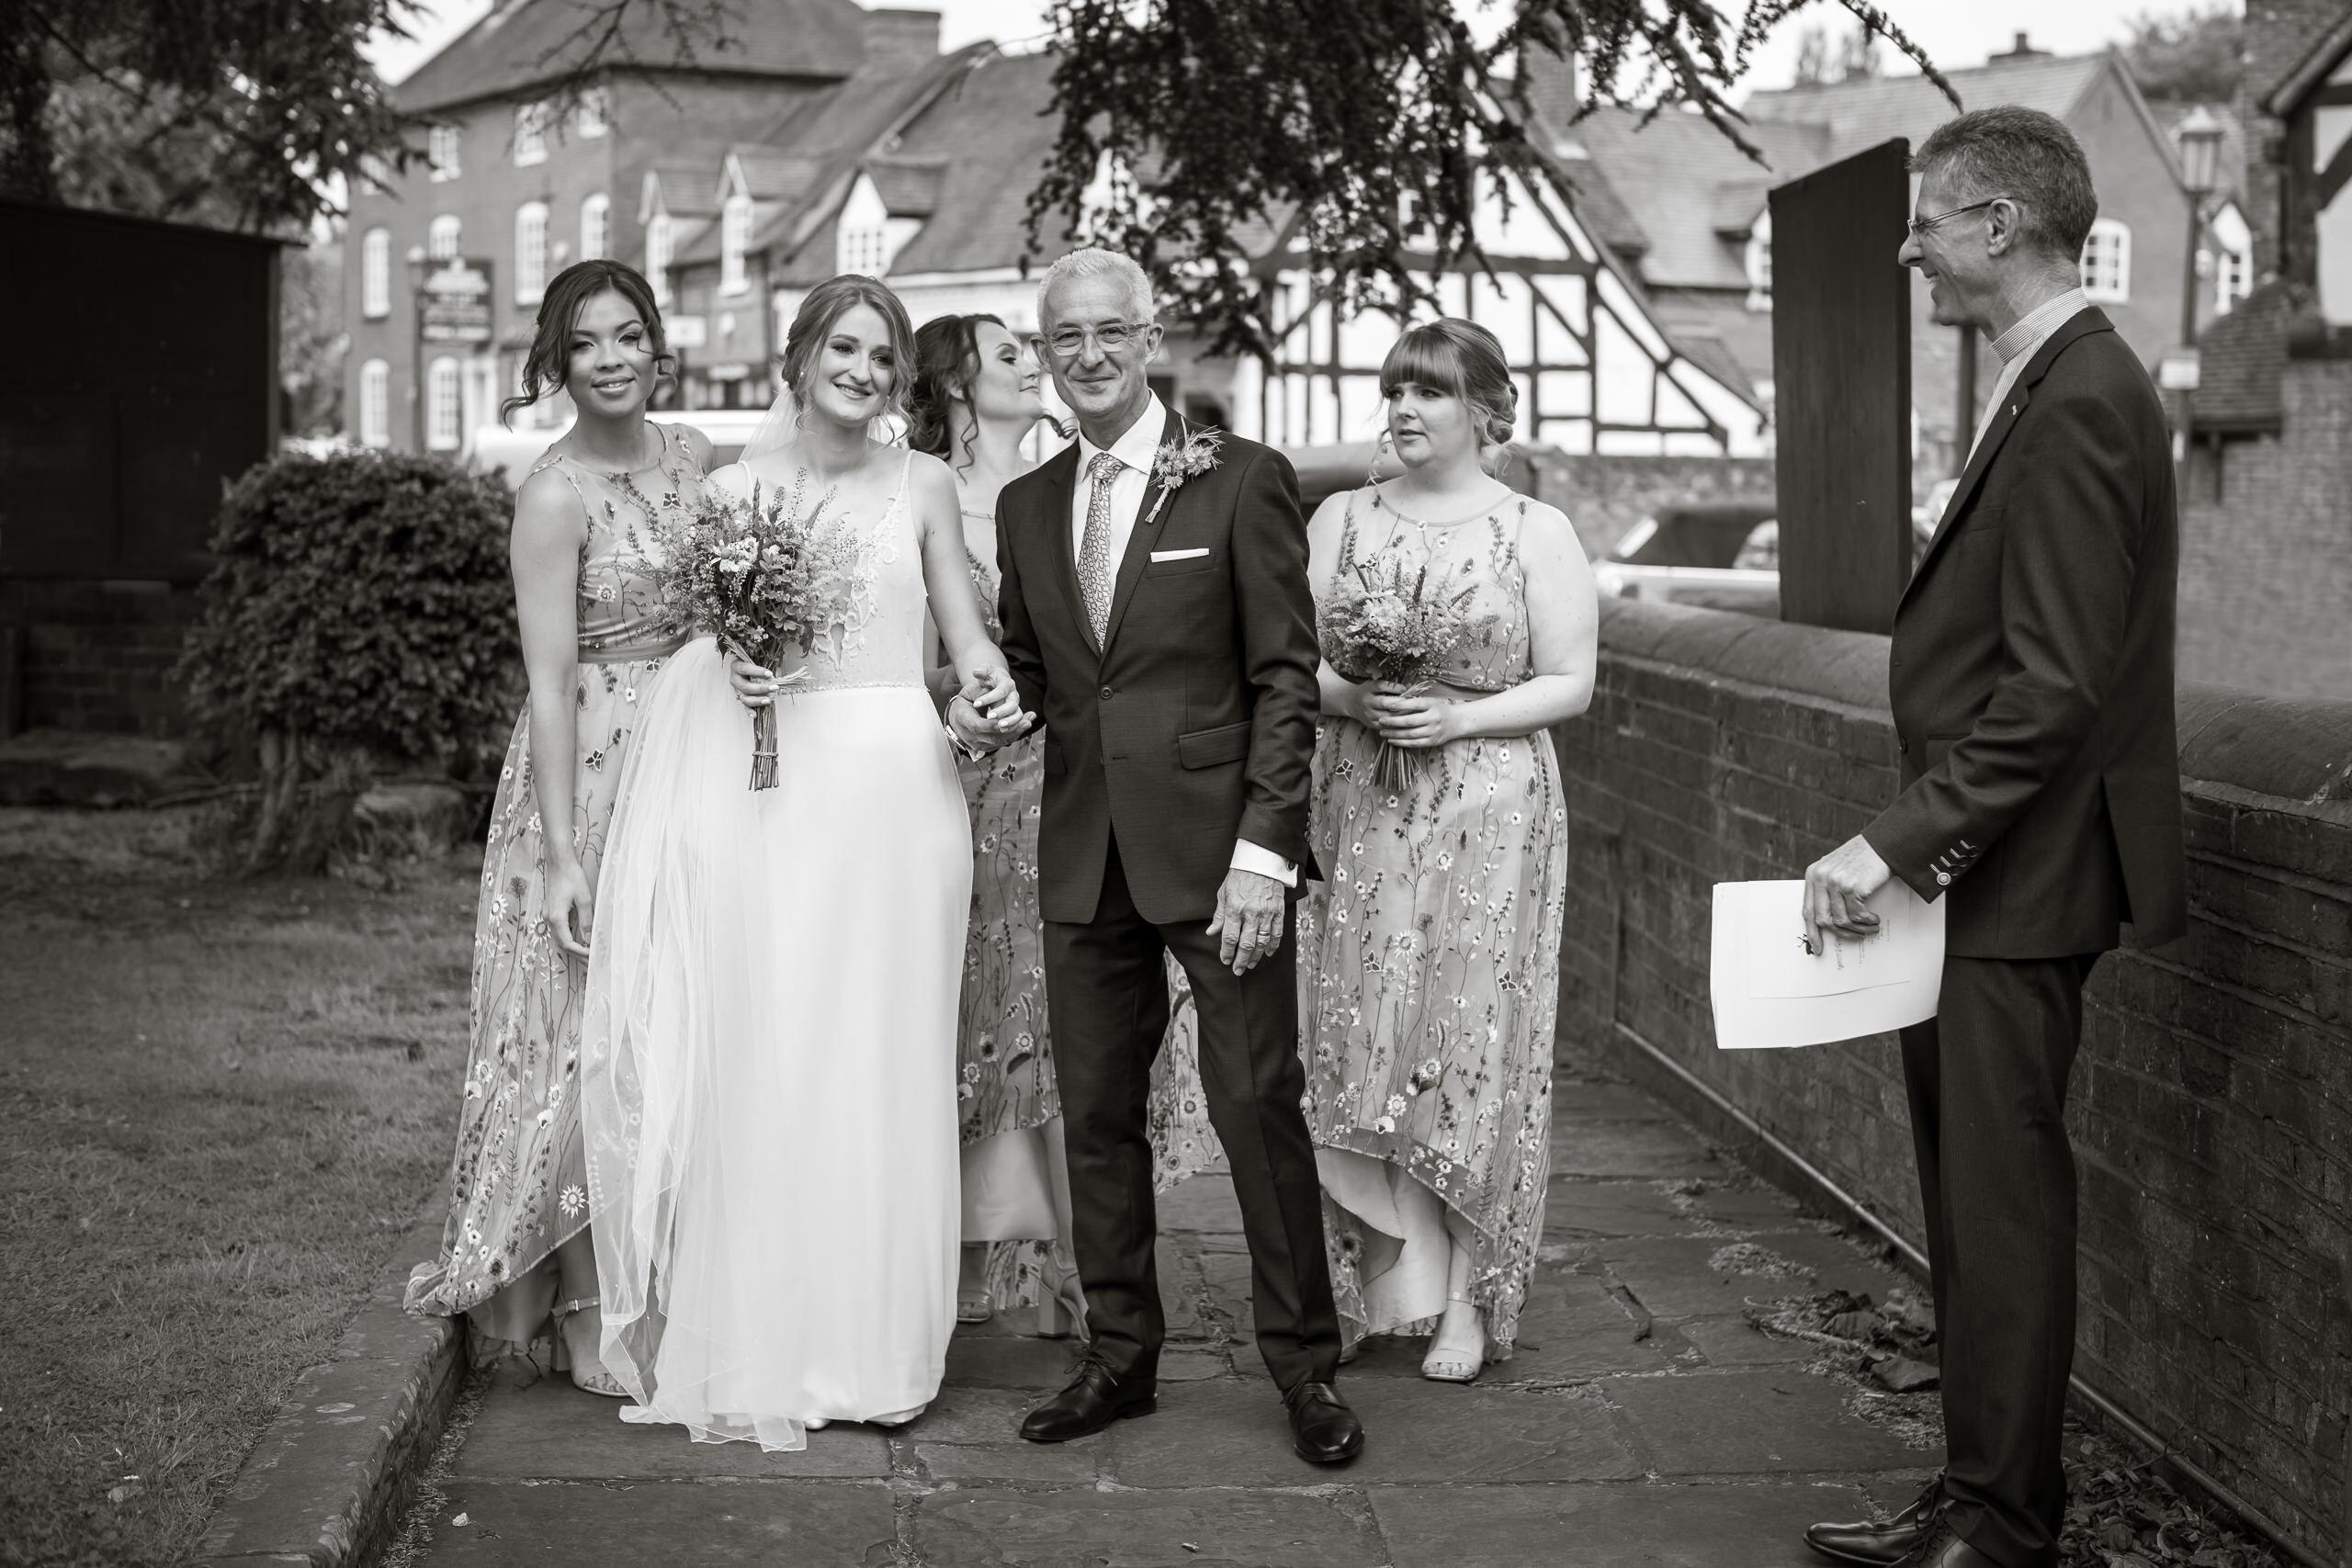 Wedding Gallery In The Village Bride Father Walk To Church By Brett Leica Photographer